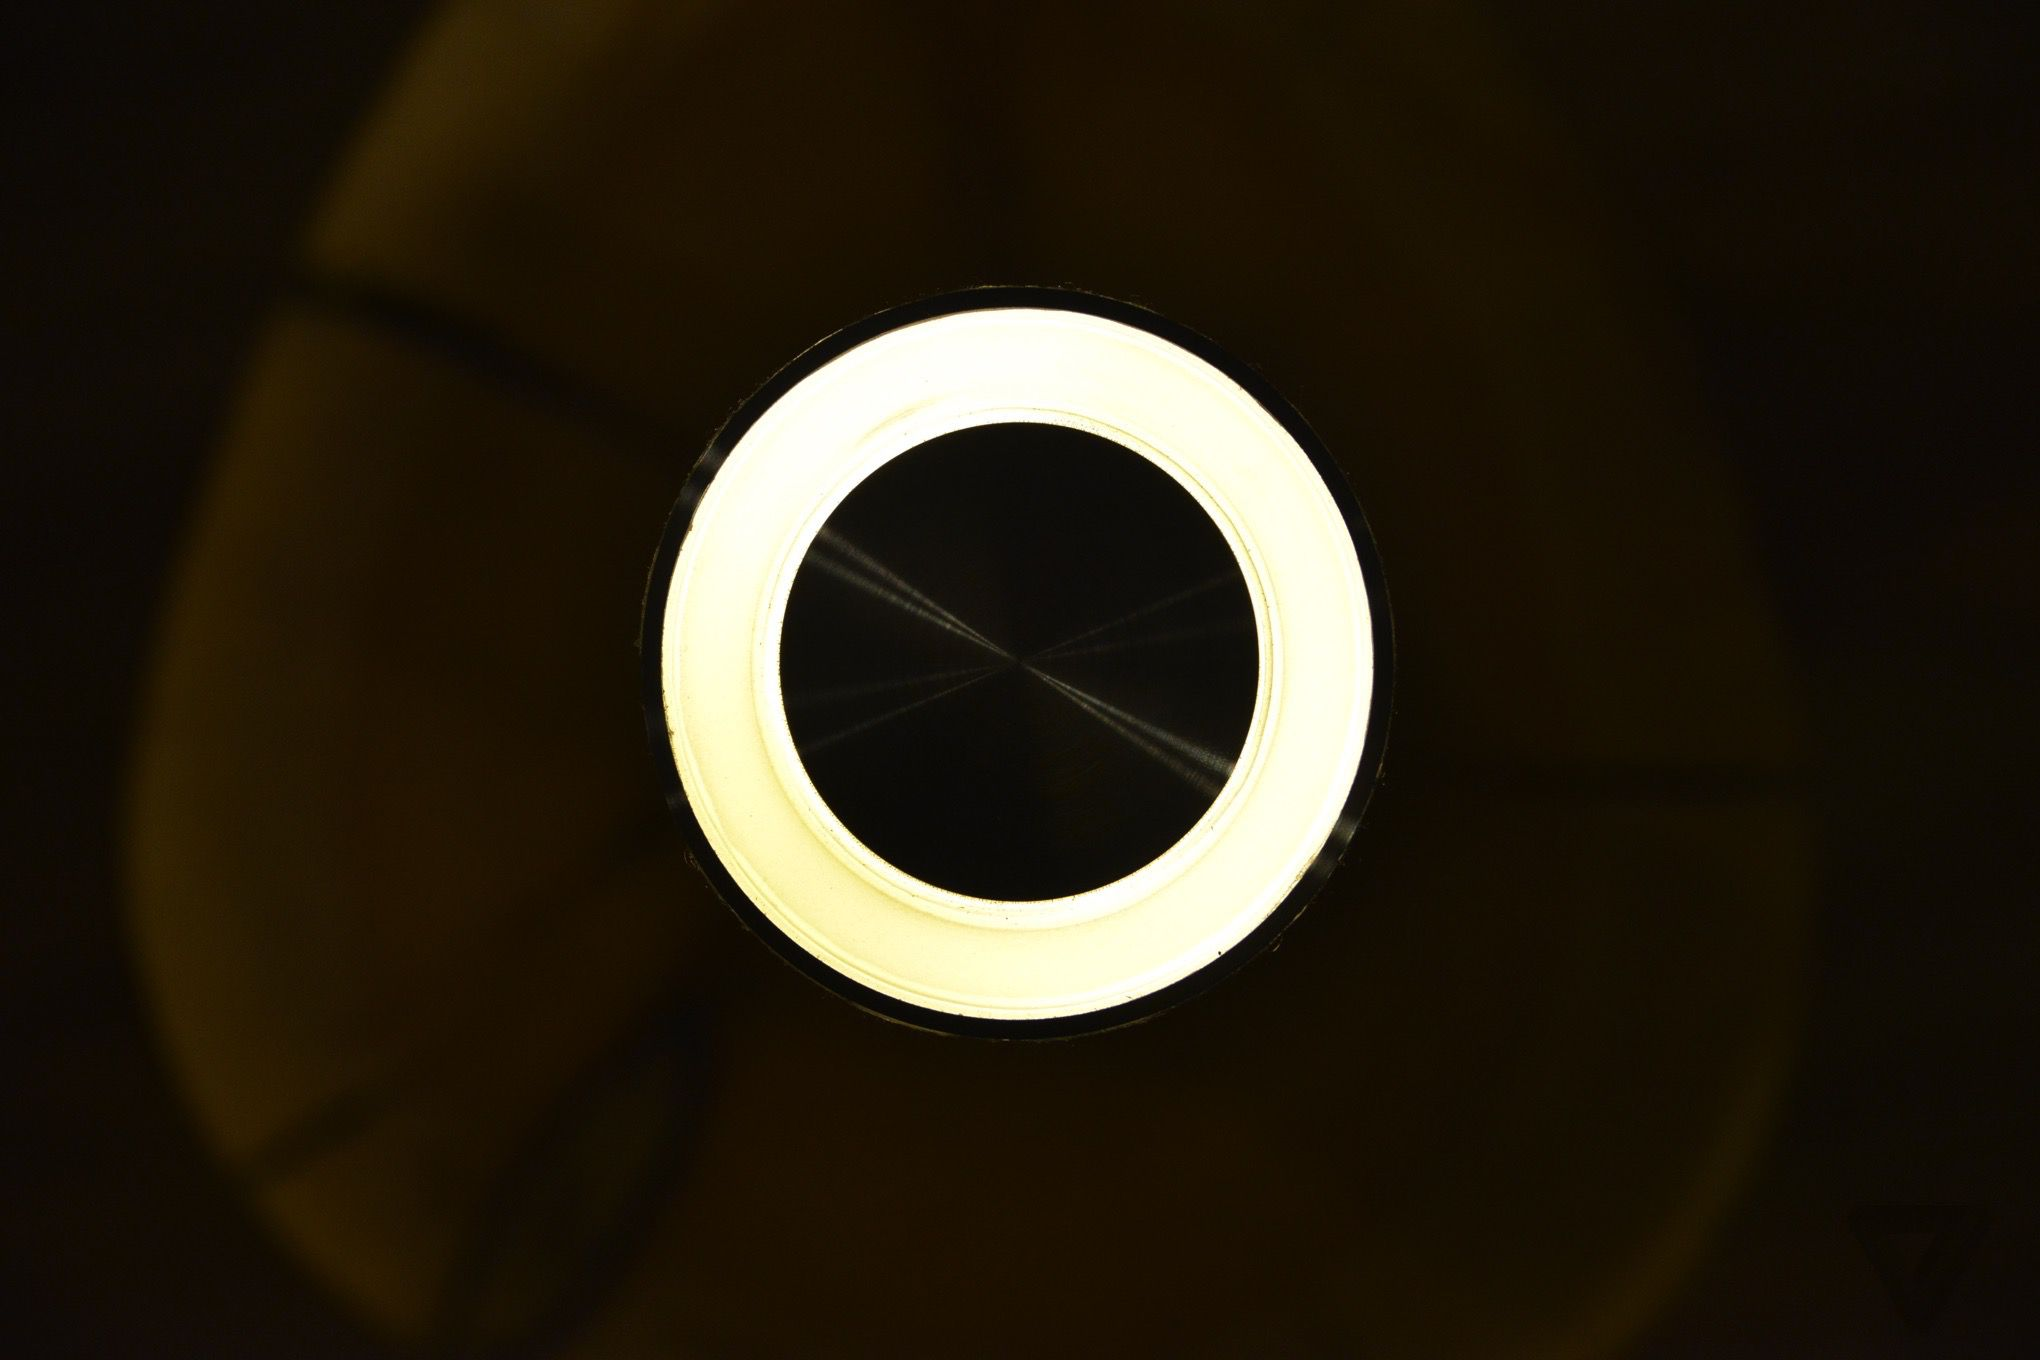 sony symphonic light speaker at ces 2015